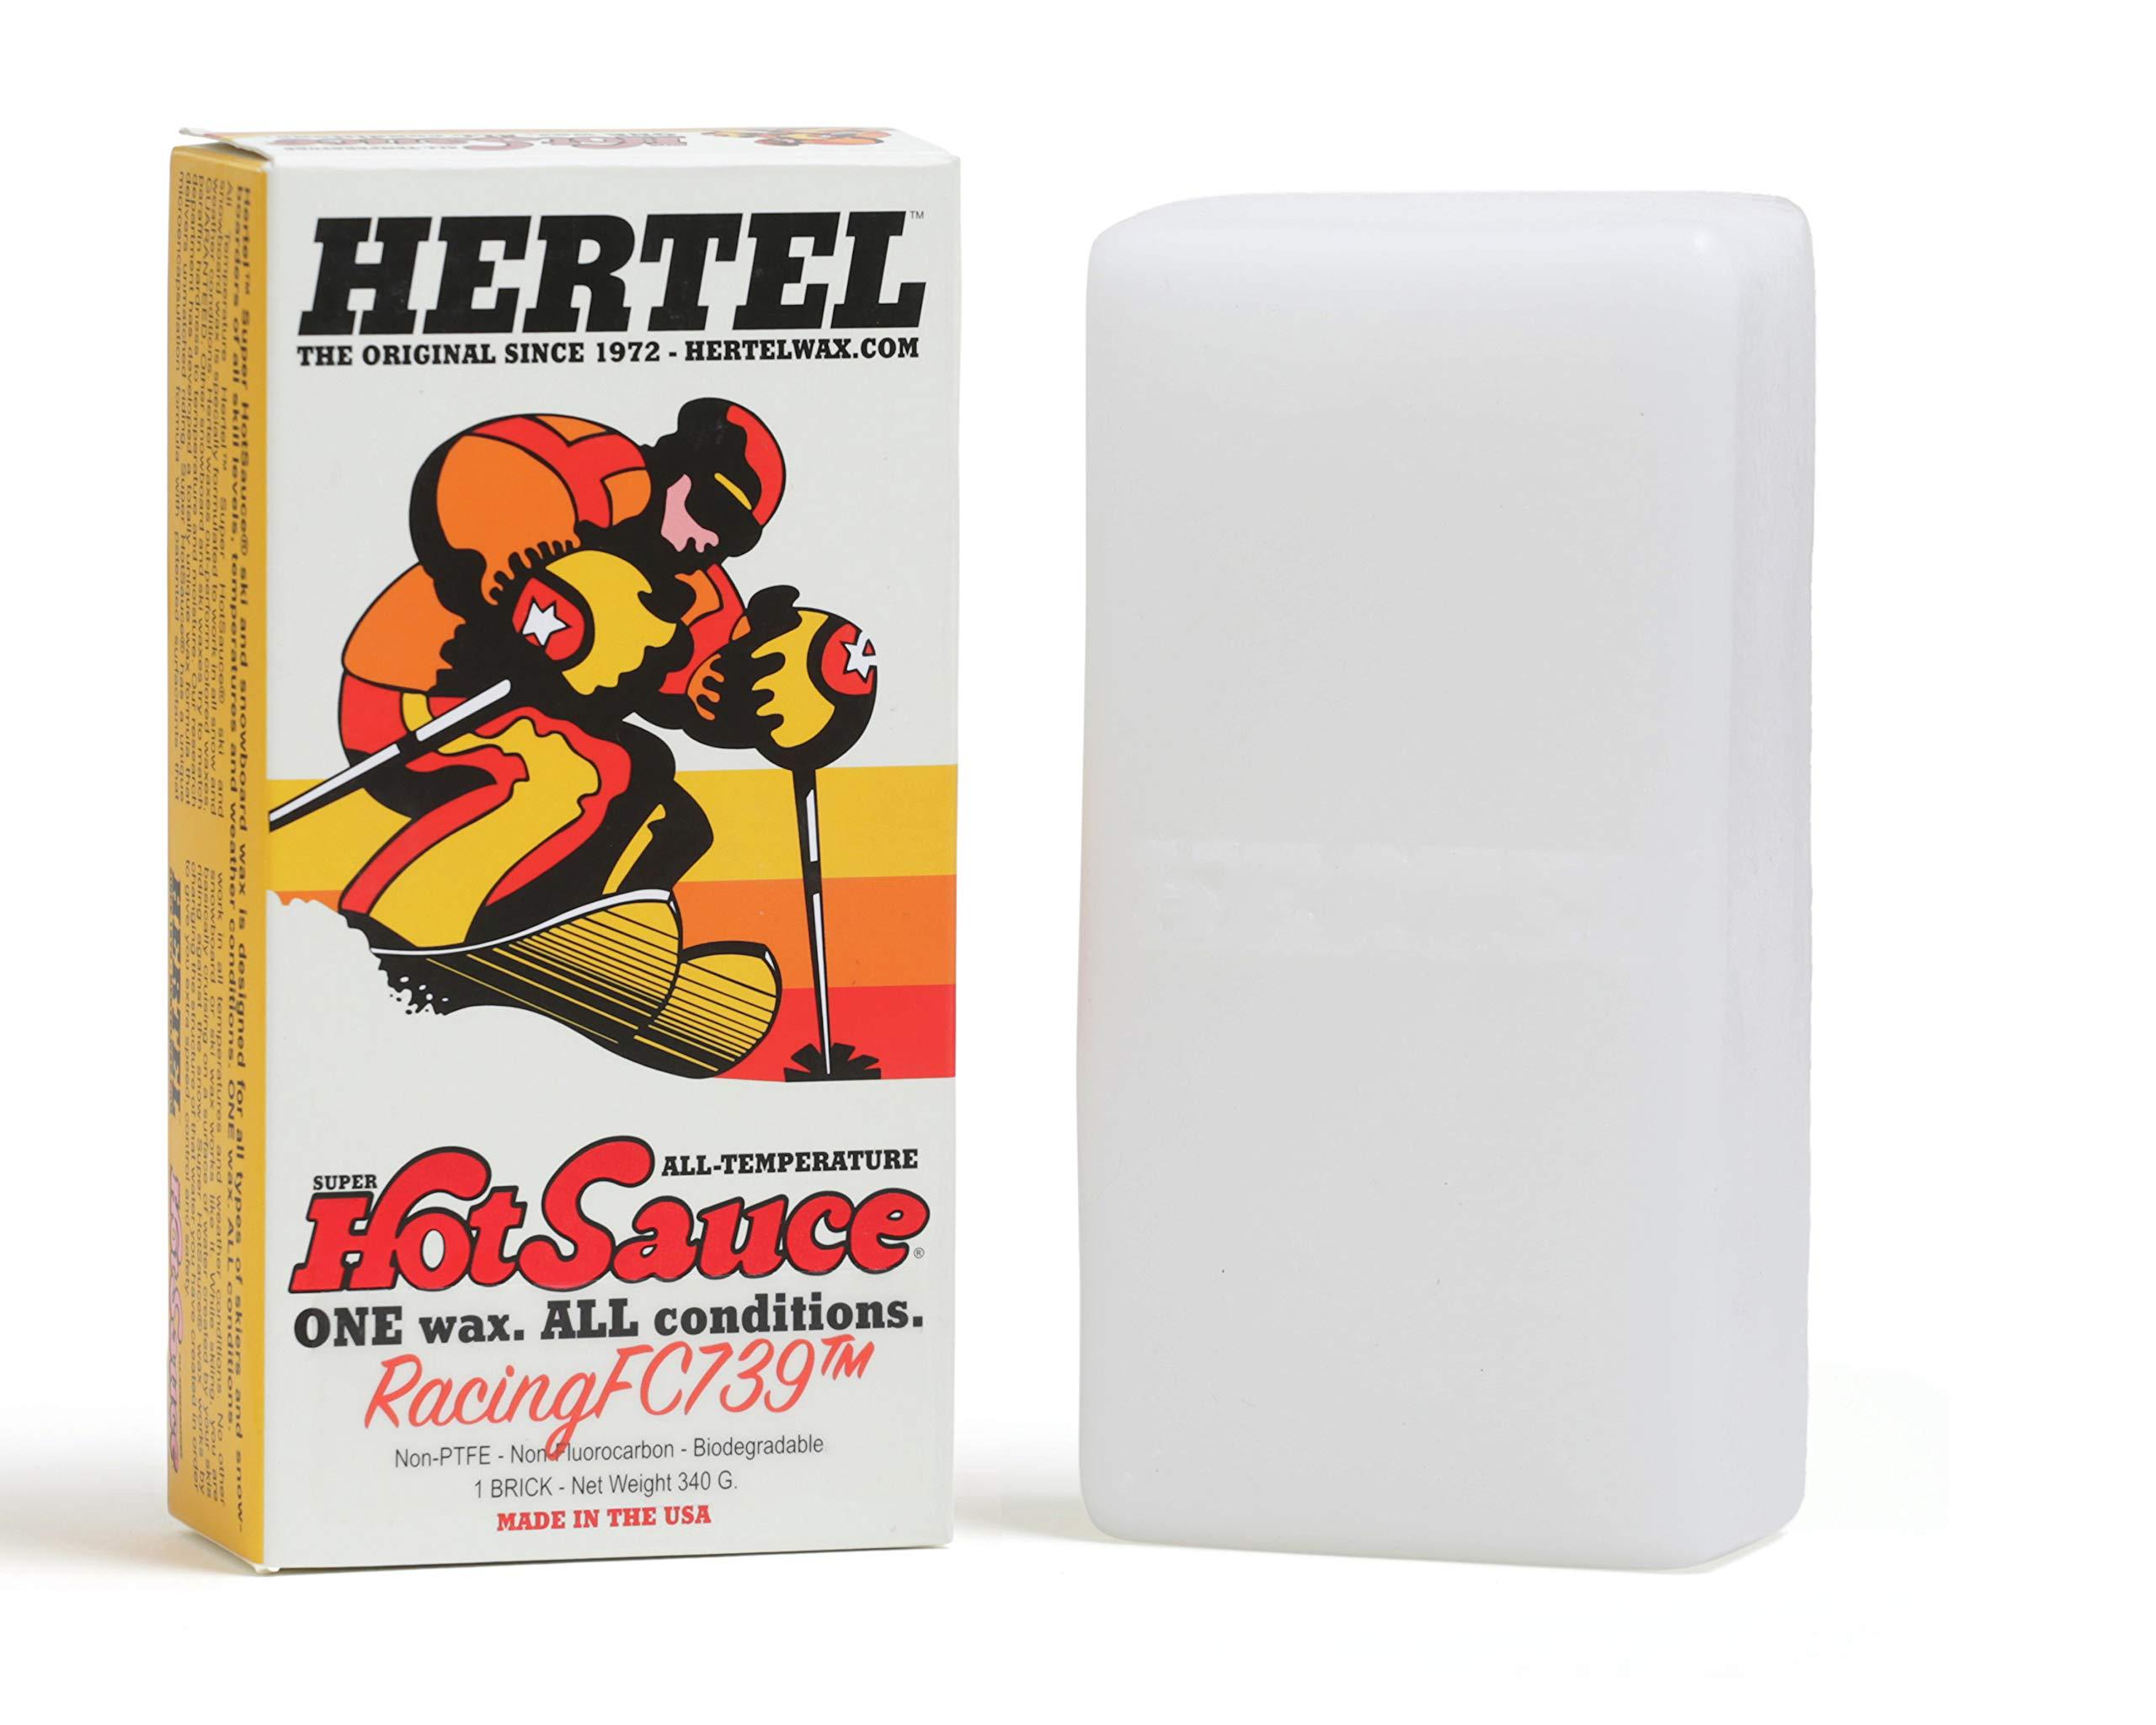 Hertel Wax Racing 739 All Temperature Ski/Snowboard Wax 340 Grams by Hertel Wax